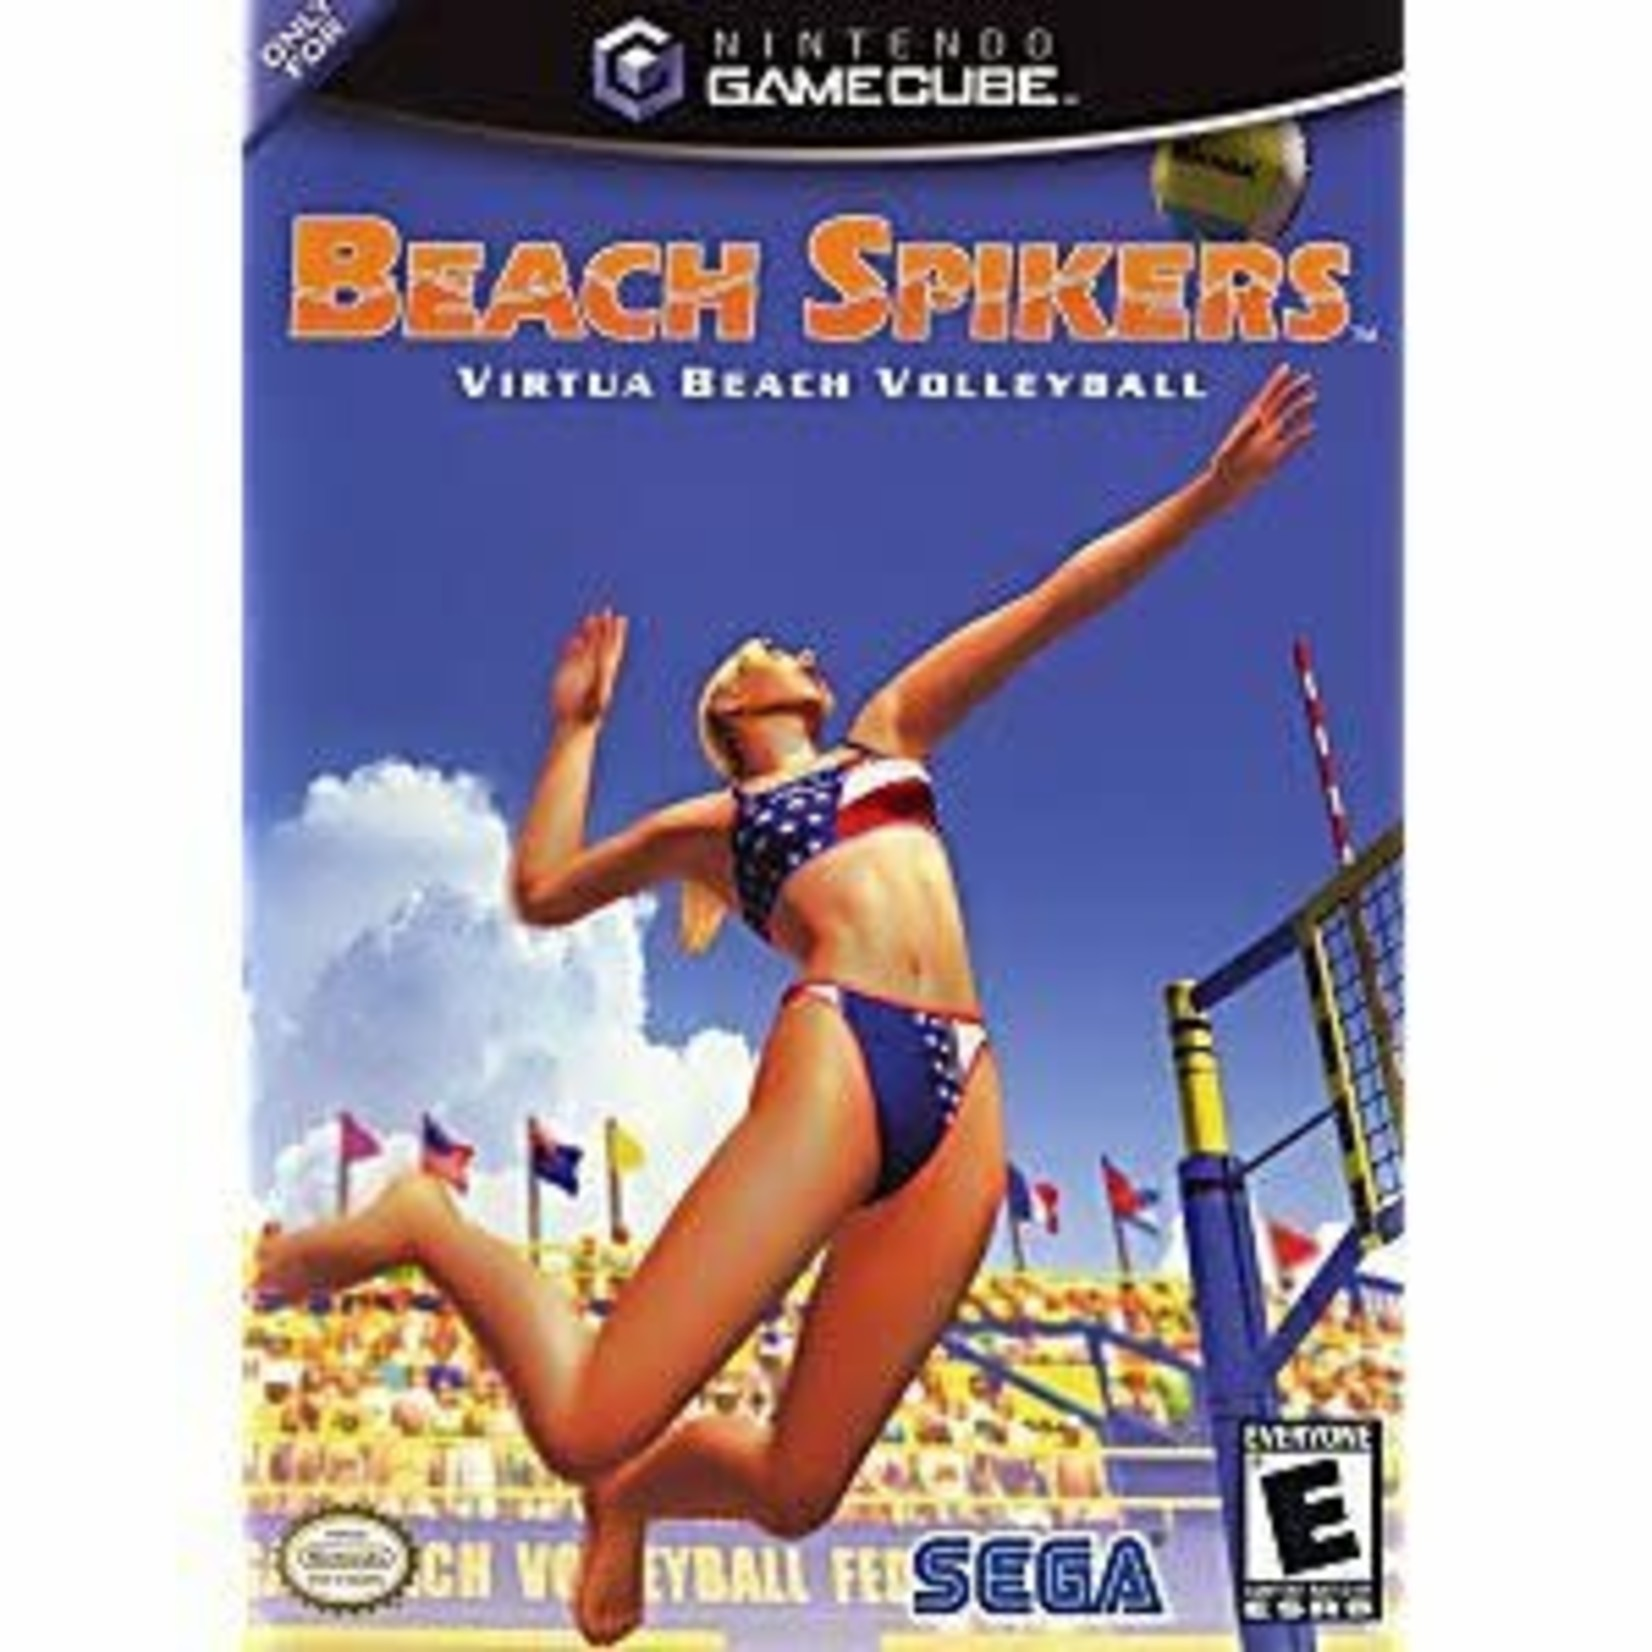 GCU-Beach Spikers